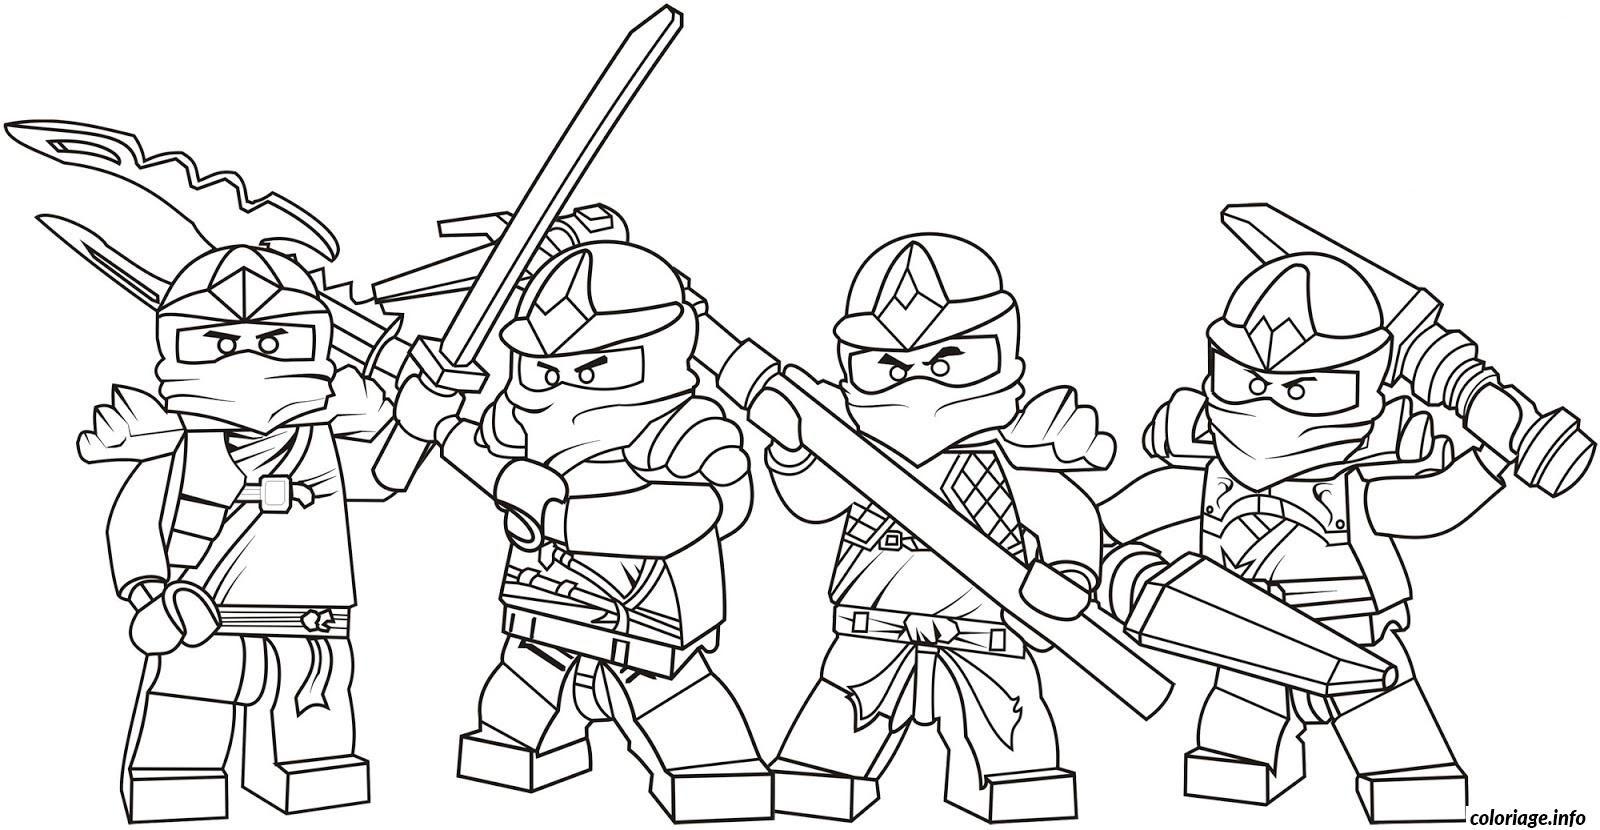 Coloriage Lego Ninjago Team Dessin  Imprimer